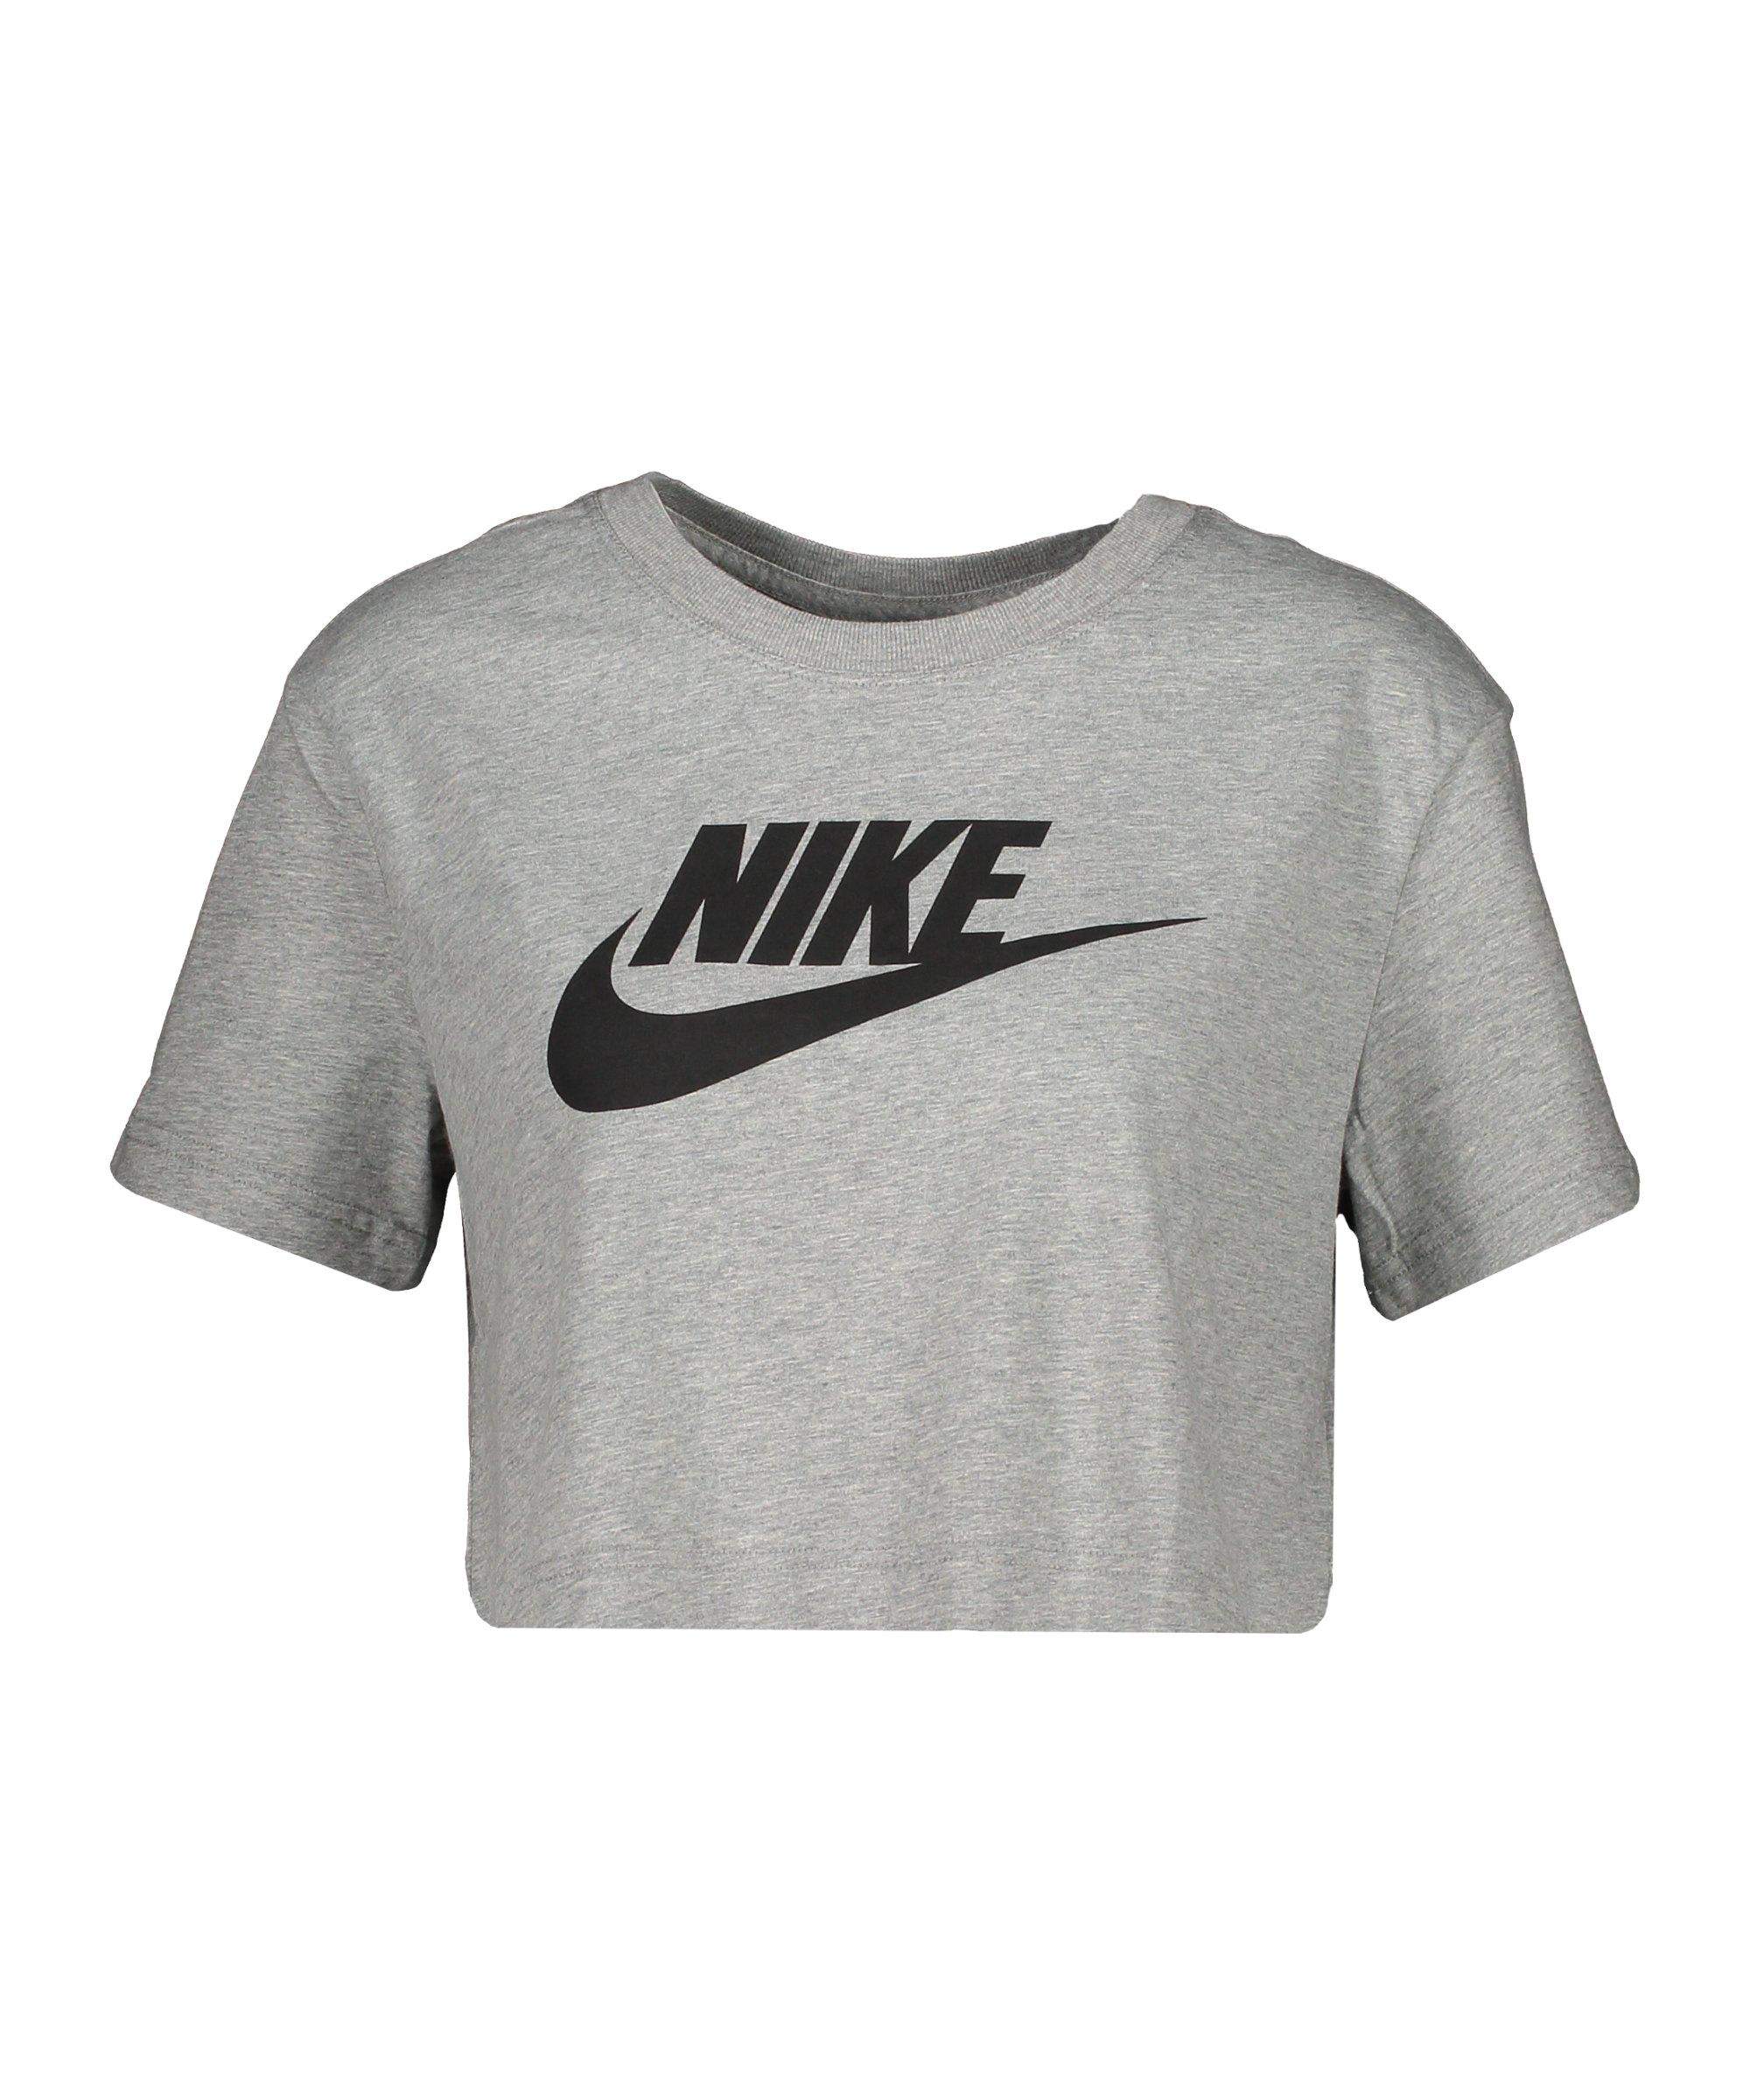 Nike Essential Croped T-Shirt Damen Grau F063 - grau